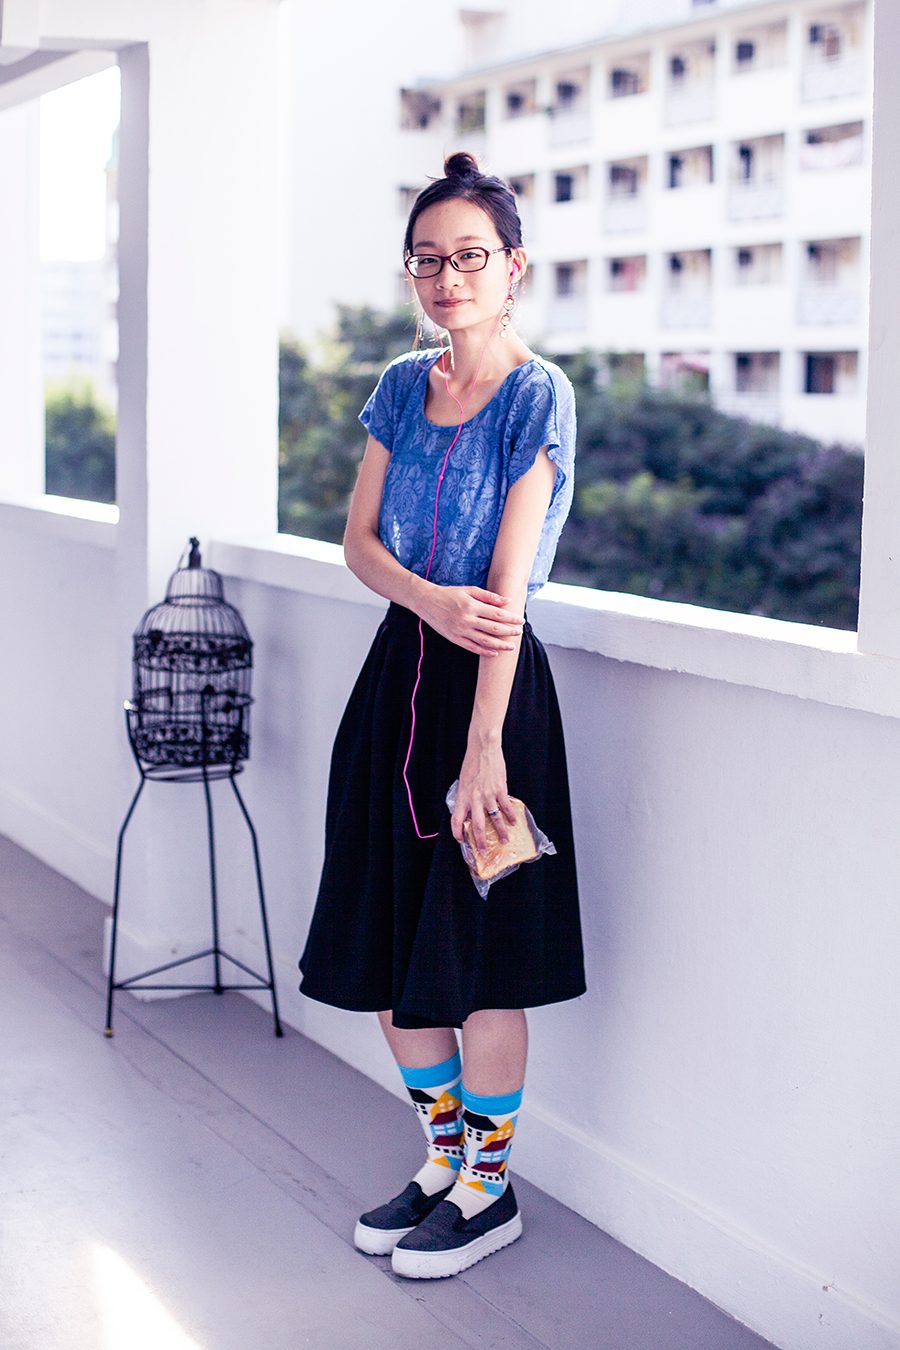 Forever 21 blue lace top, Lowry's Farm black midi skirt with pockets, Dresslink house print crew socks, Matryoshka earrings, Spurr monique sneakers platform loafers via Zalora.